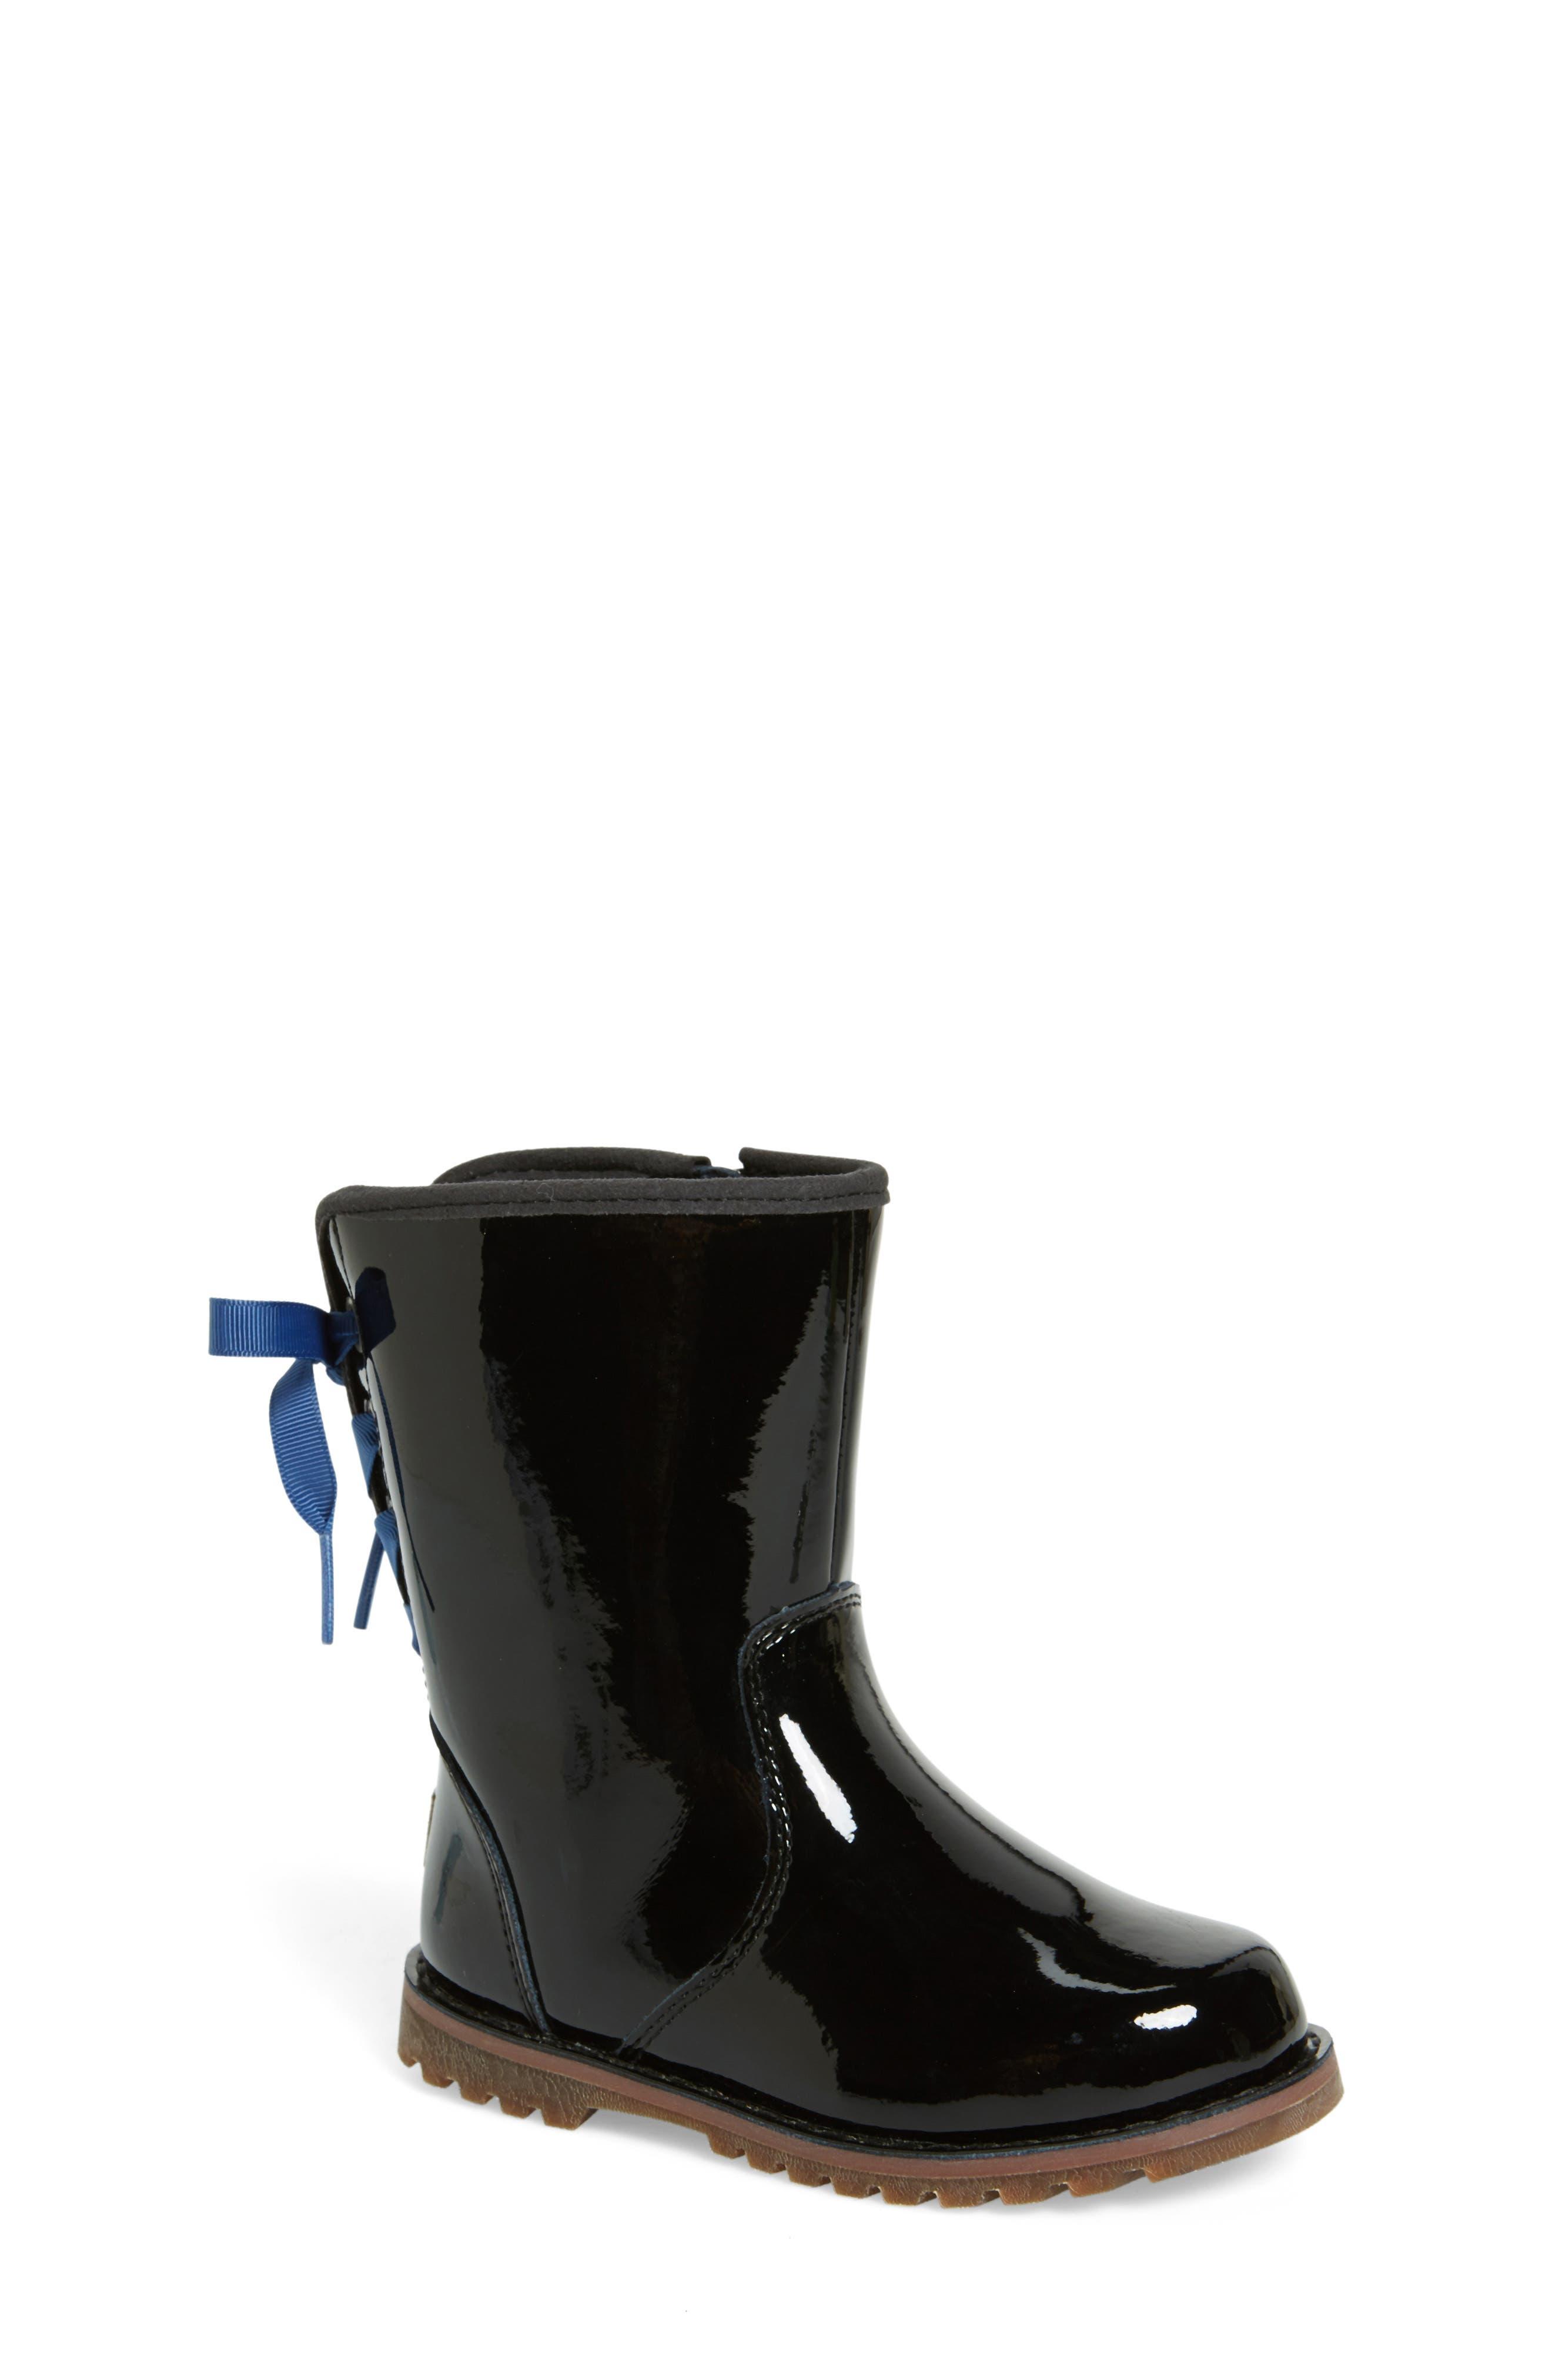 Corene Patent Leather Boot,                         Main,                         color, Black/ Black